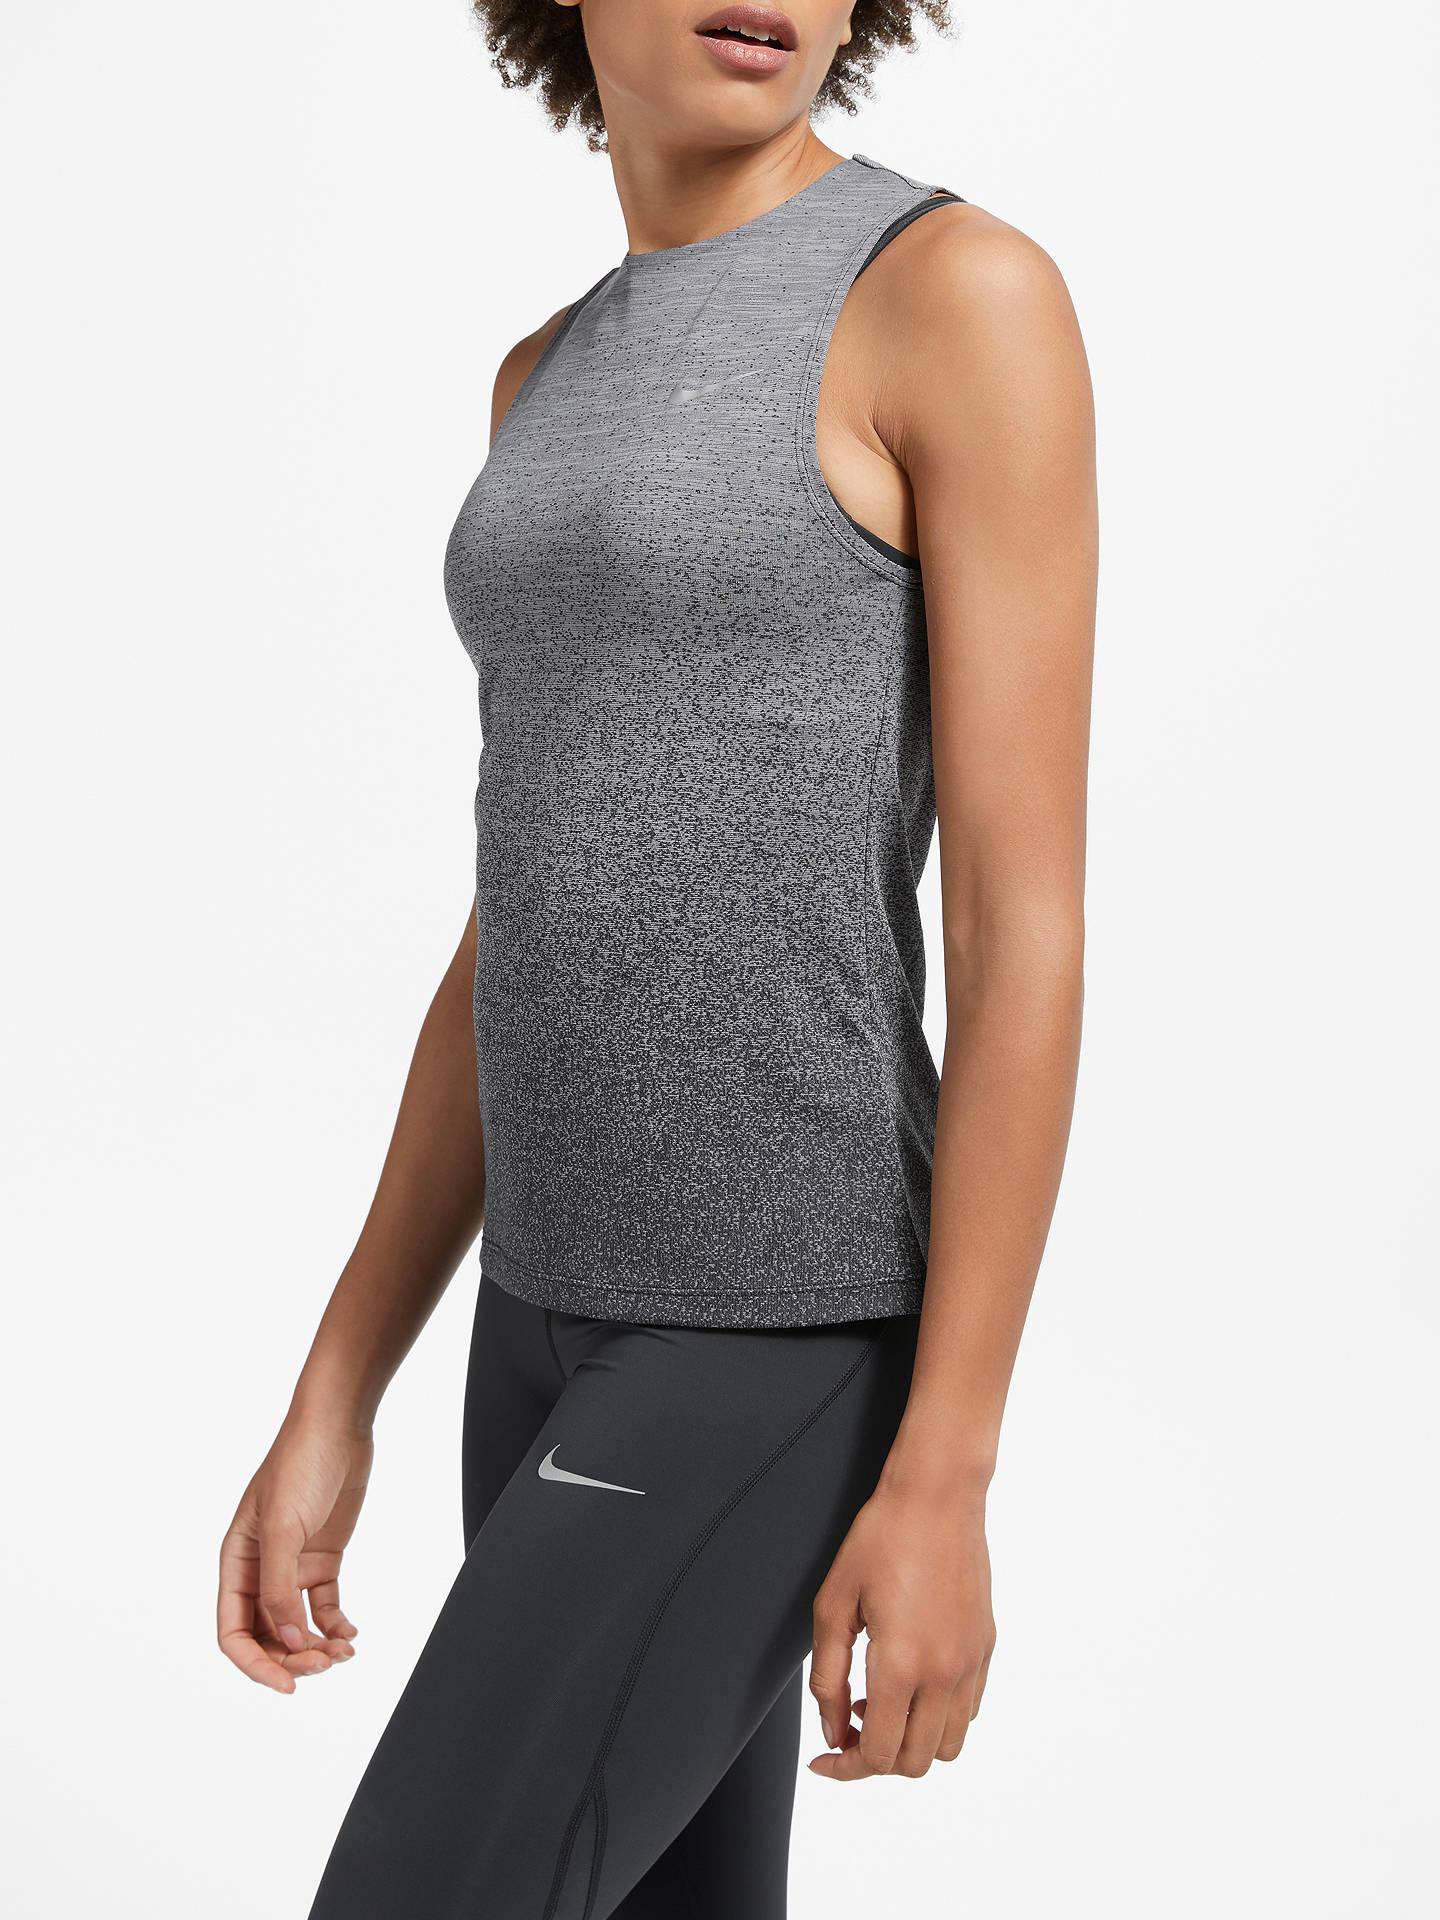 39451a65f5246 ... Buy Nike Dry Medalist Running Tank Top